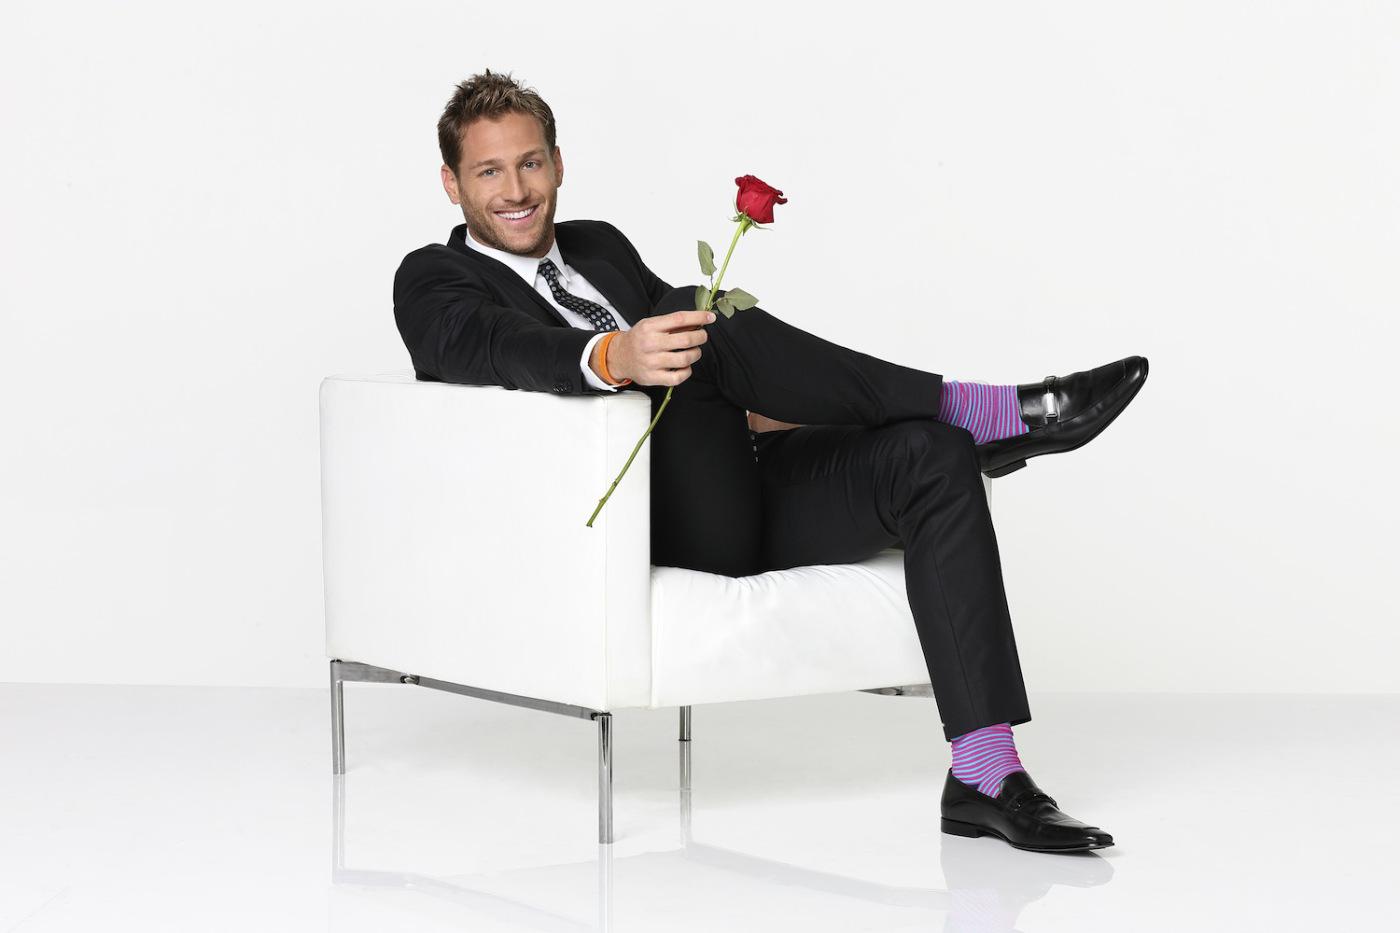 The Bachelor's Juan Pablo Galavis